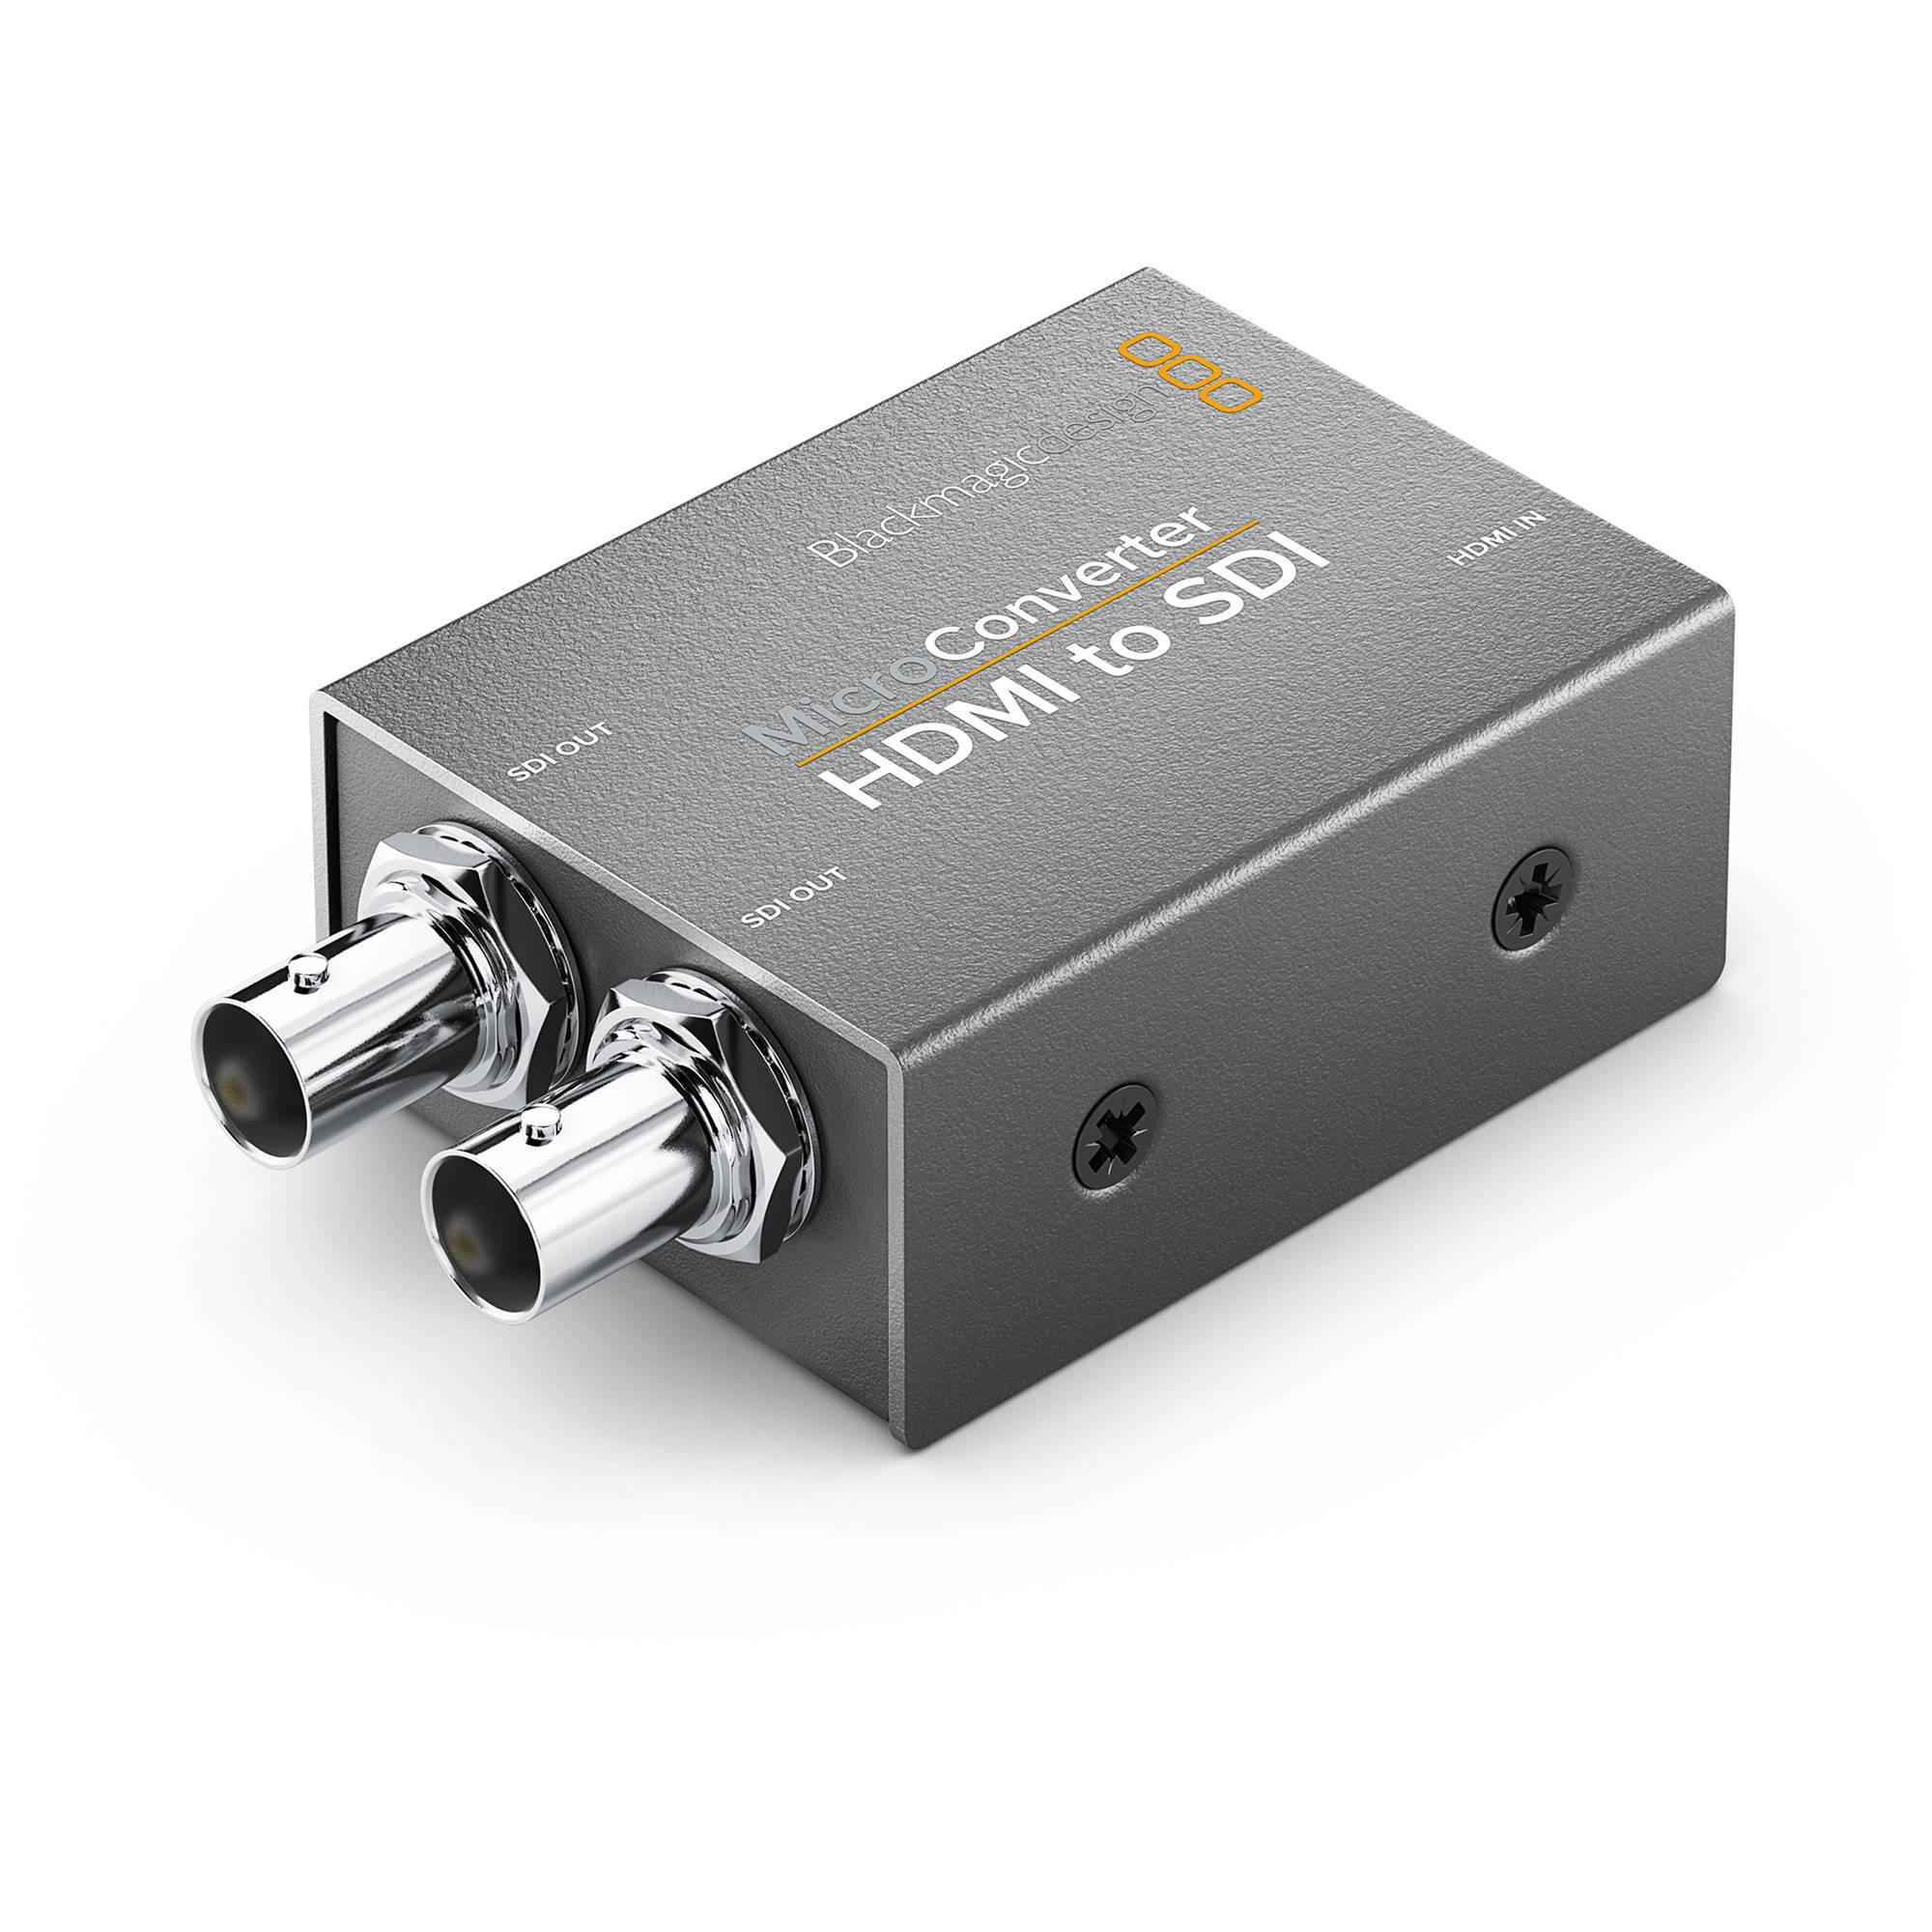 HDMI to SDI Micro Converter